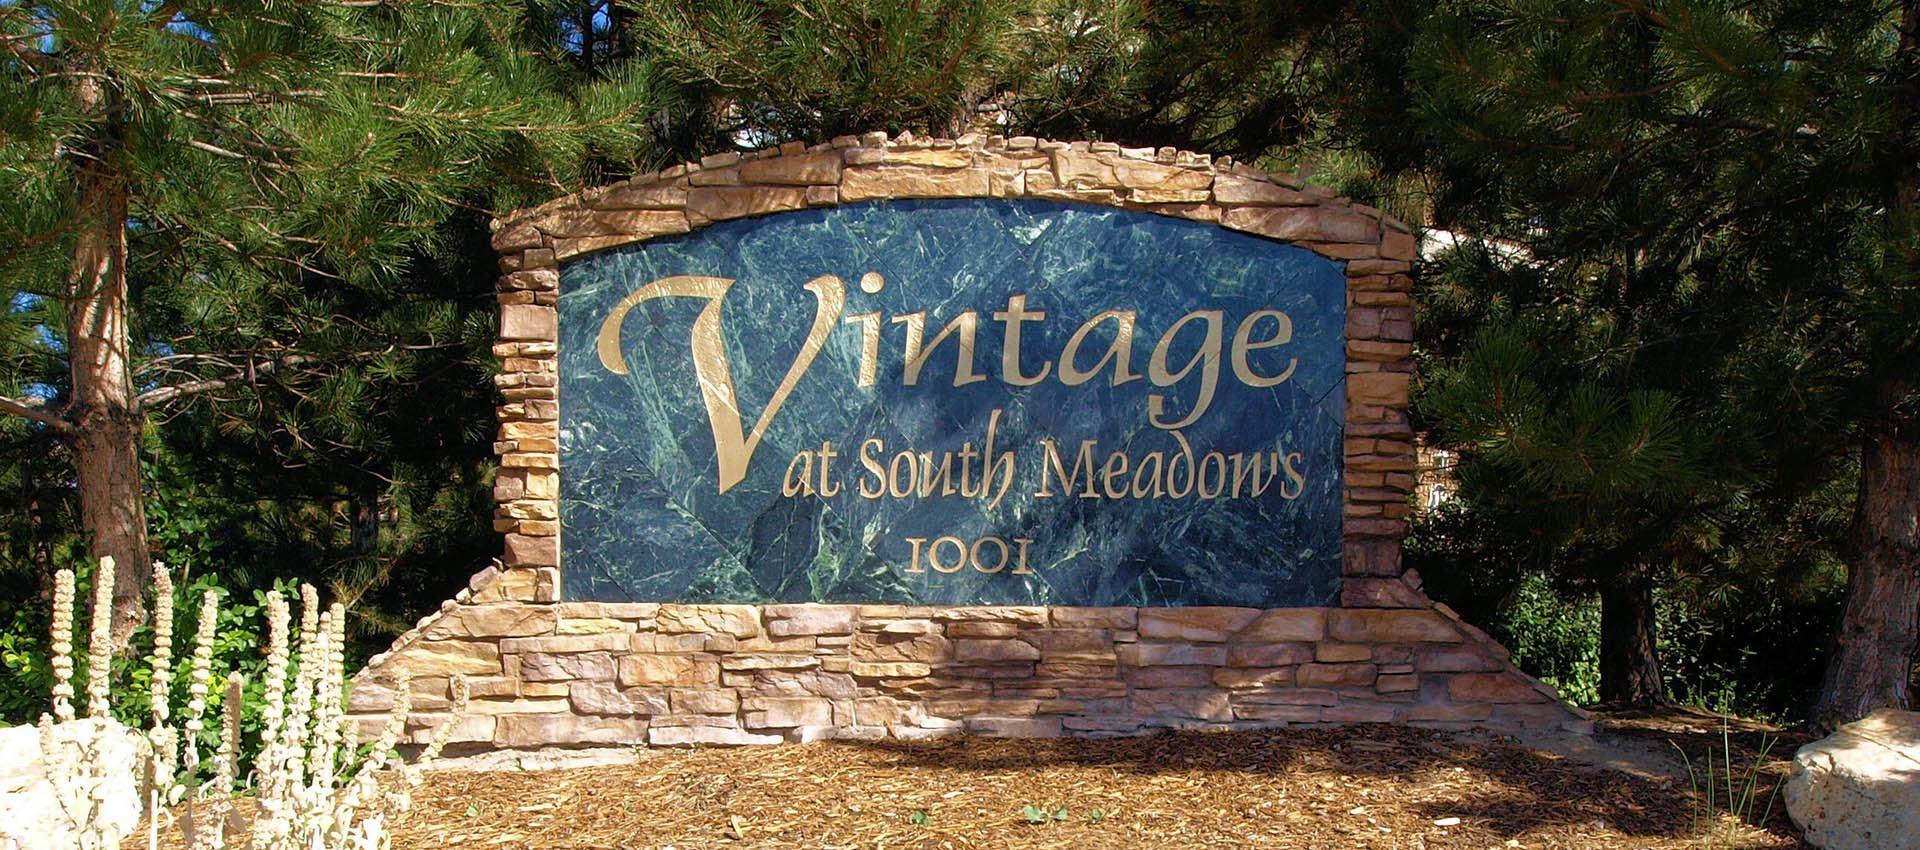 Signage at The Vintage at South Meadows Condominium Rentals in Reno